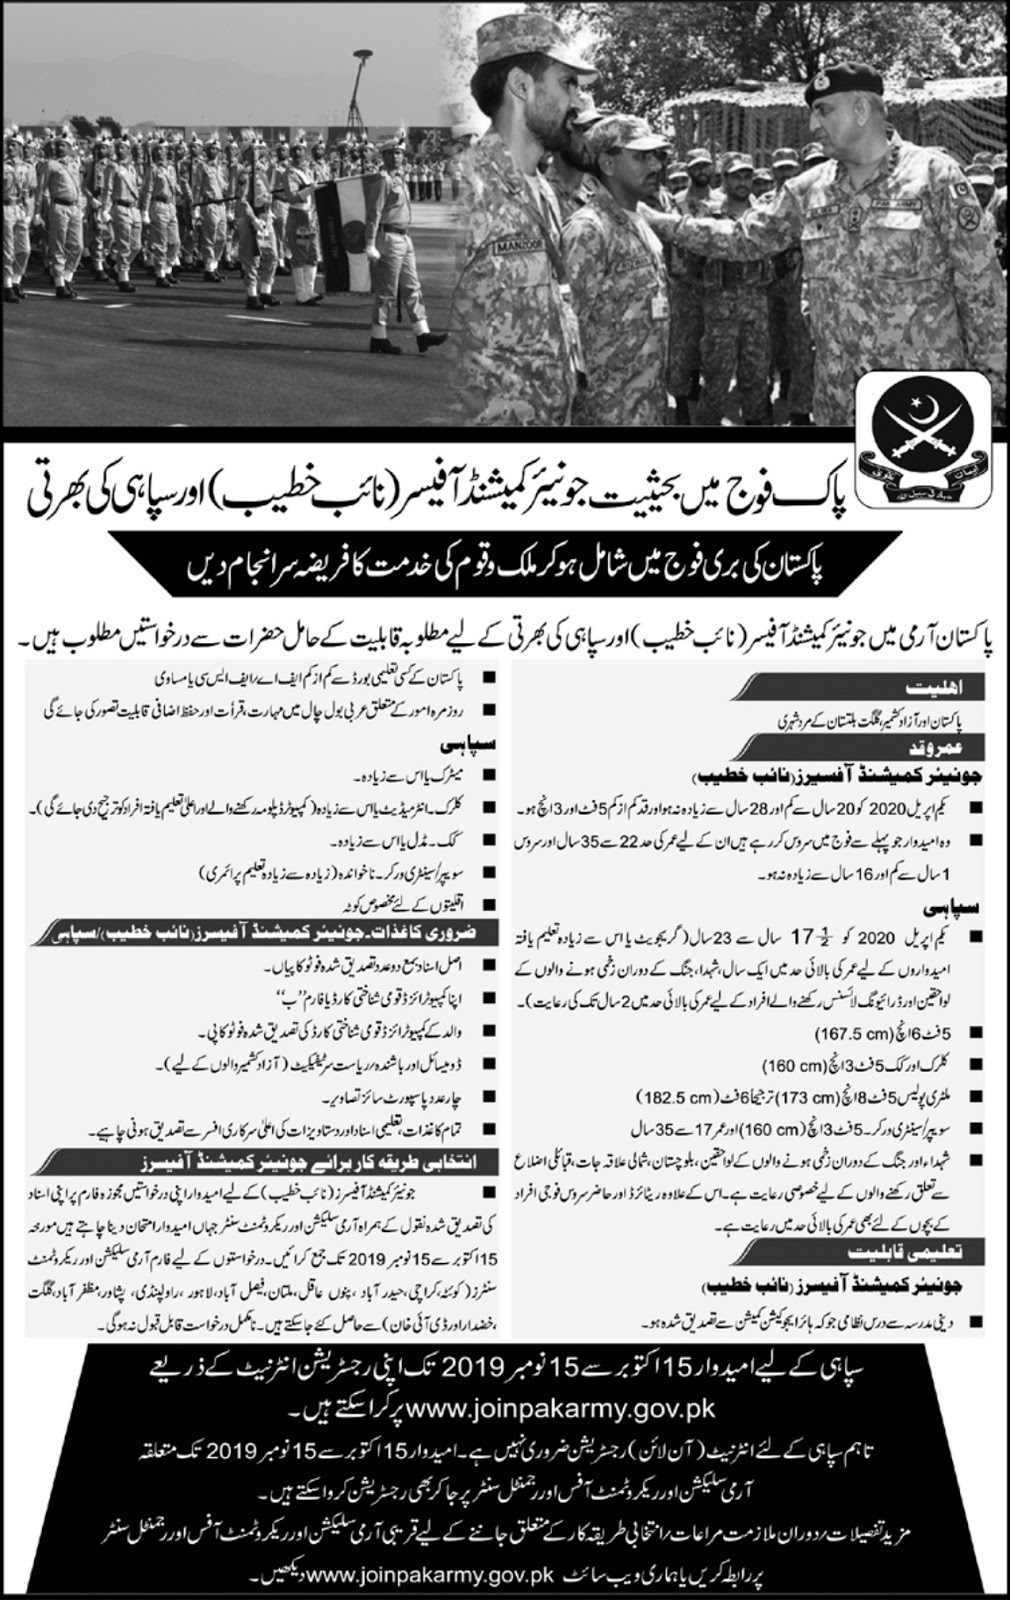 Pakistan Army Jobs 2019 Naib Khatib & Sipahi